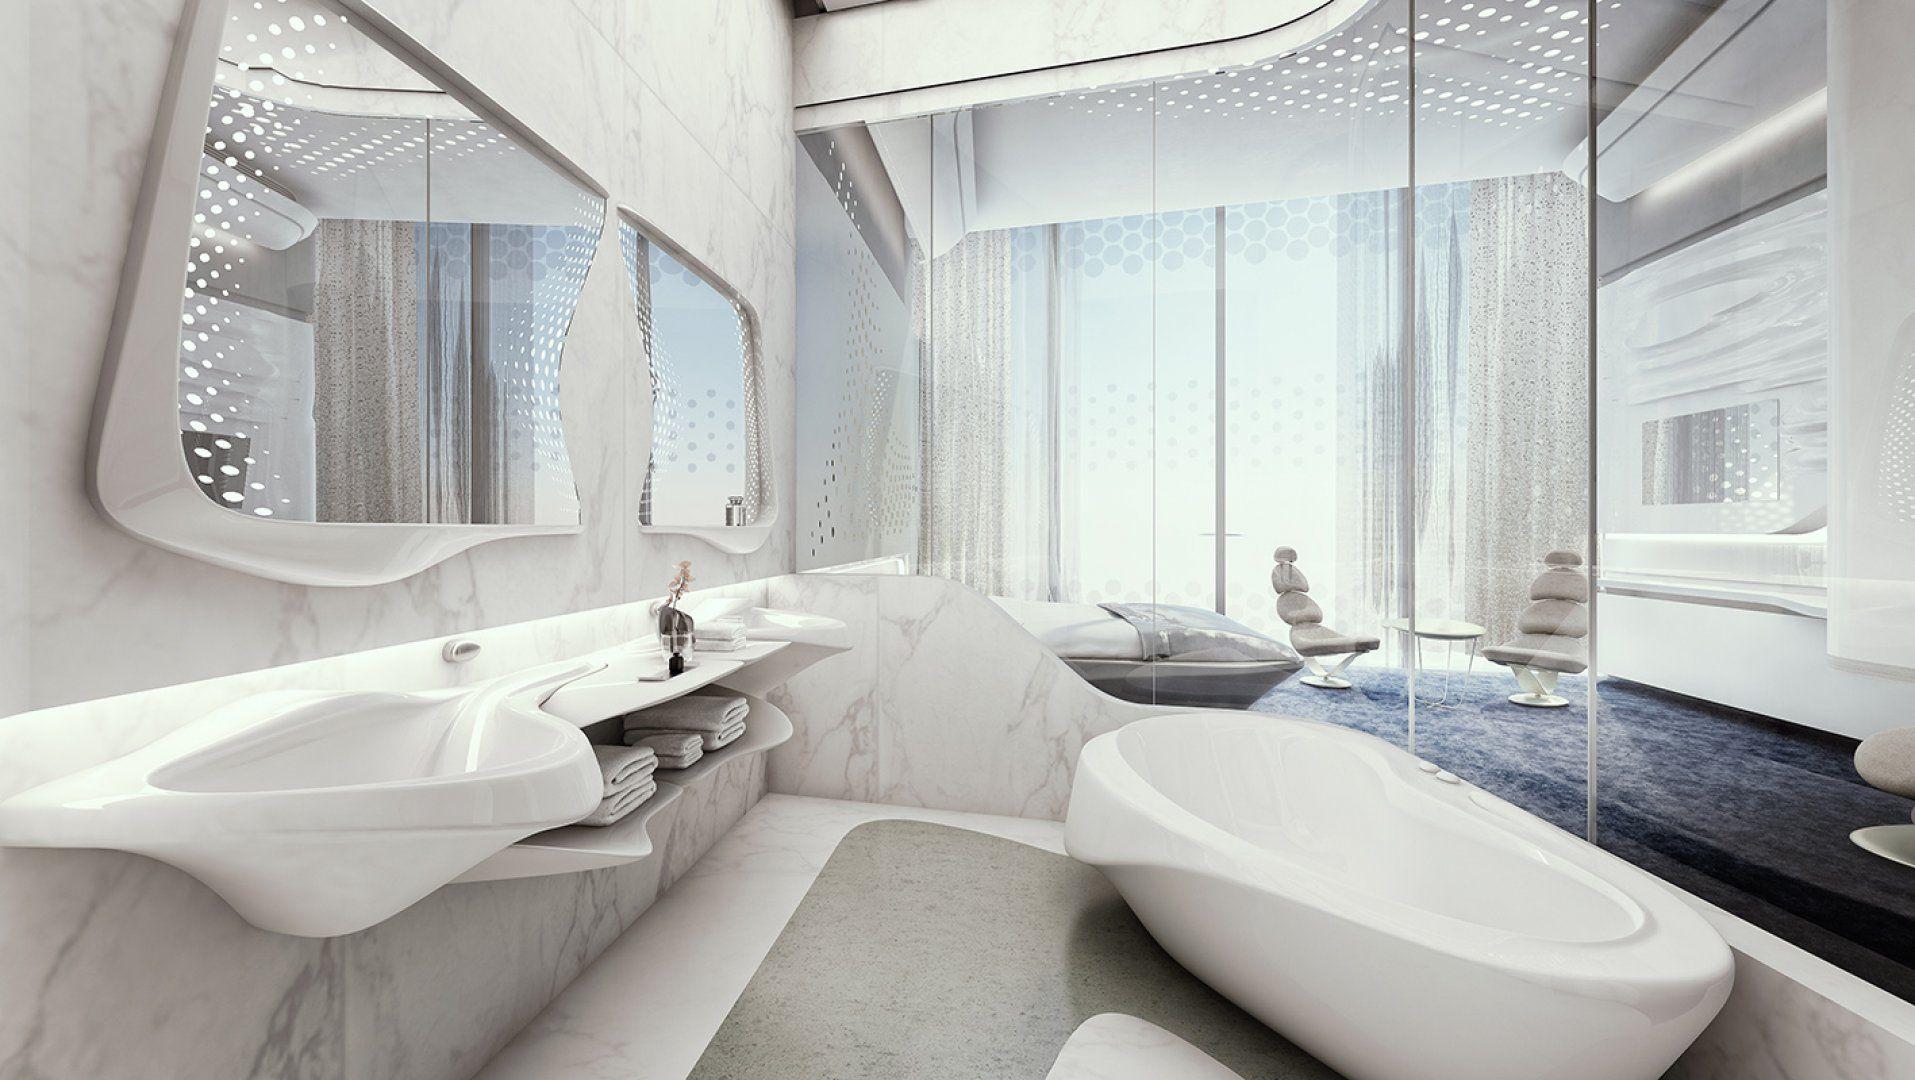 Opus - Architecture - Zaha Hadid Architects  Zaha hadid interior